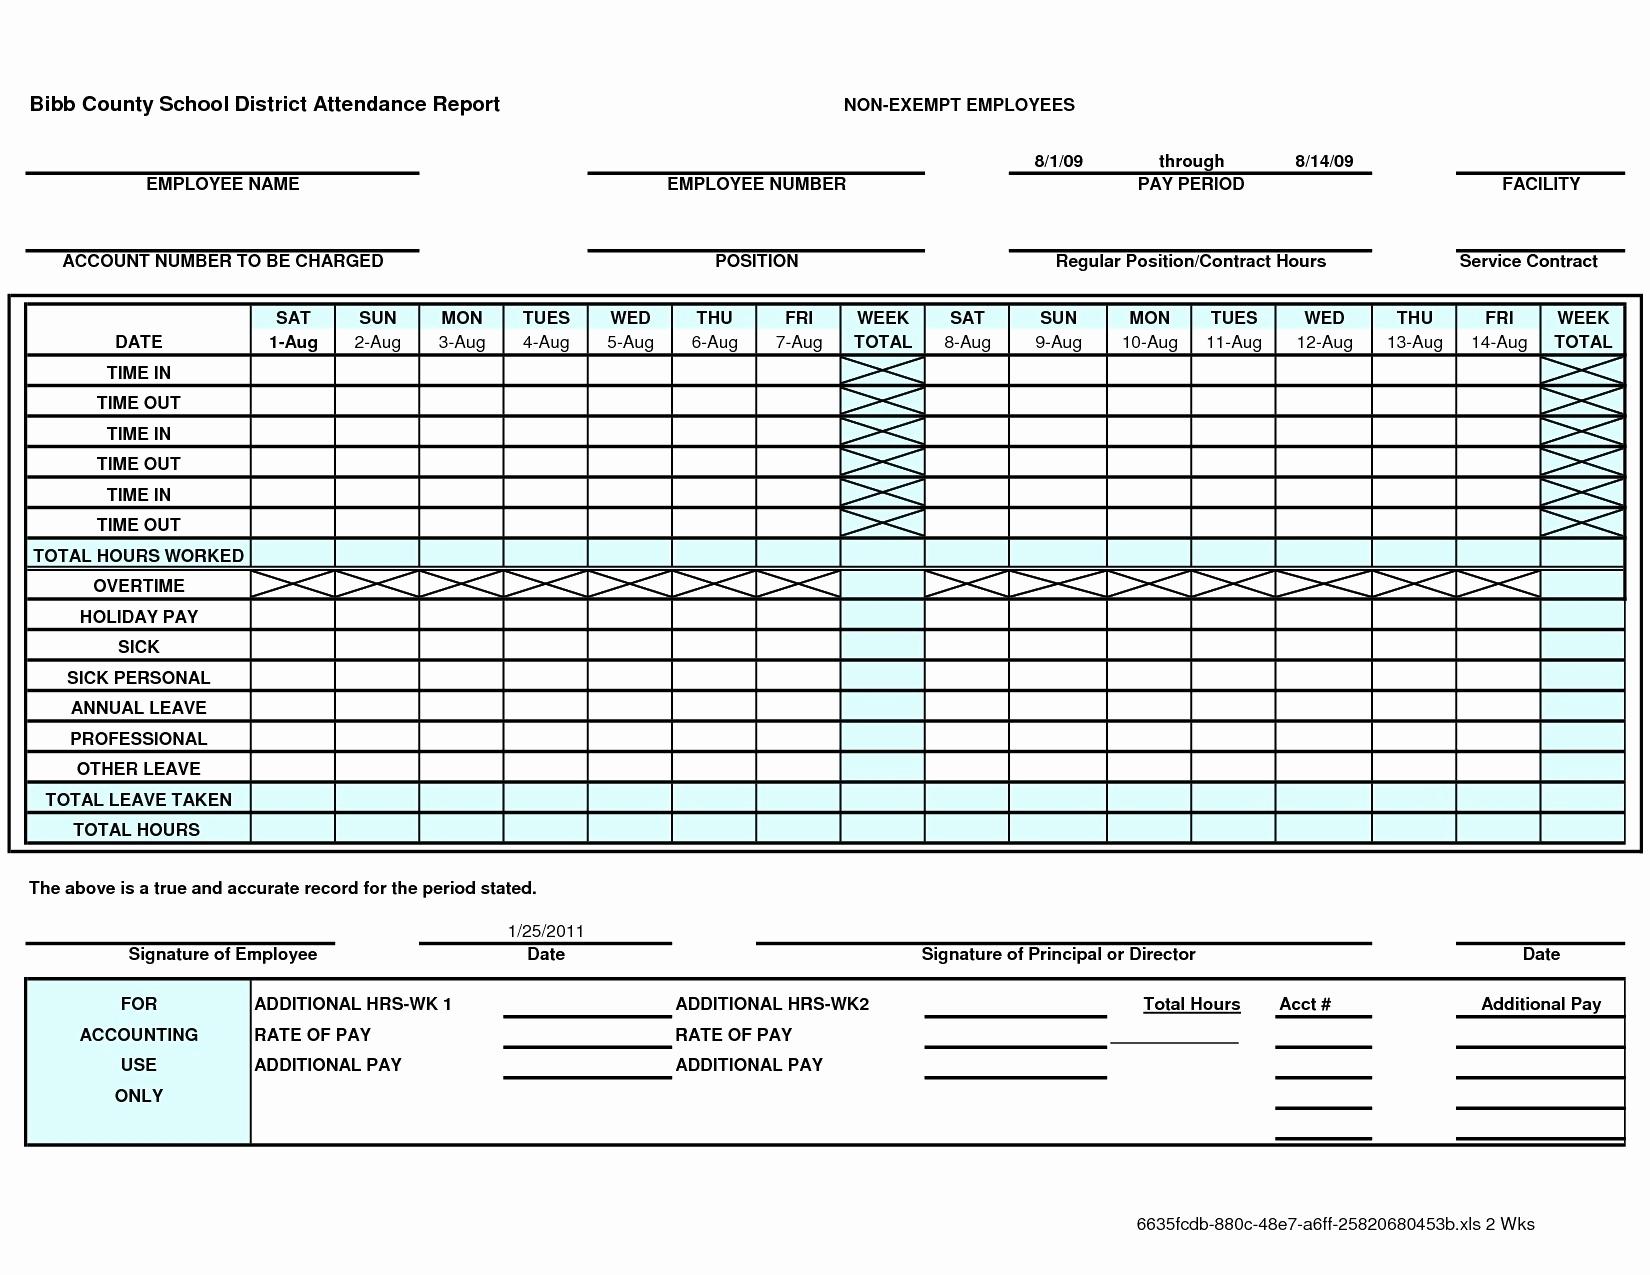 Employee Relations Tracking Spreadsheet Template Inside Employee Relations Tracking Template